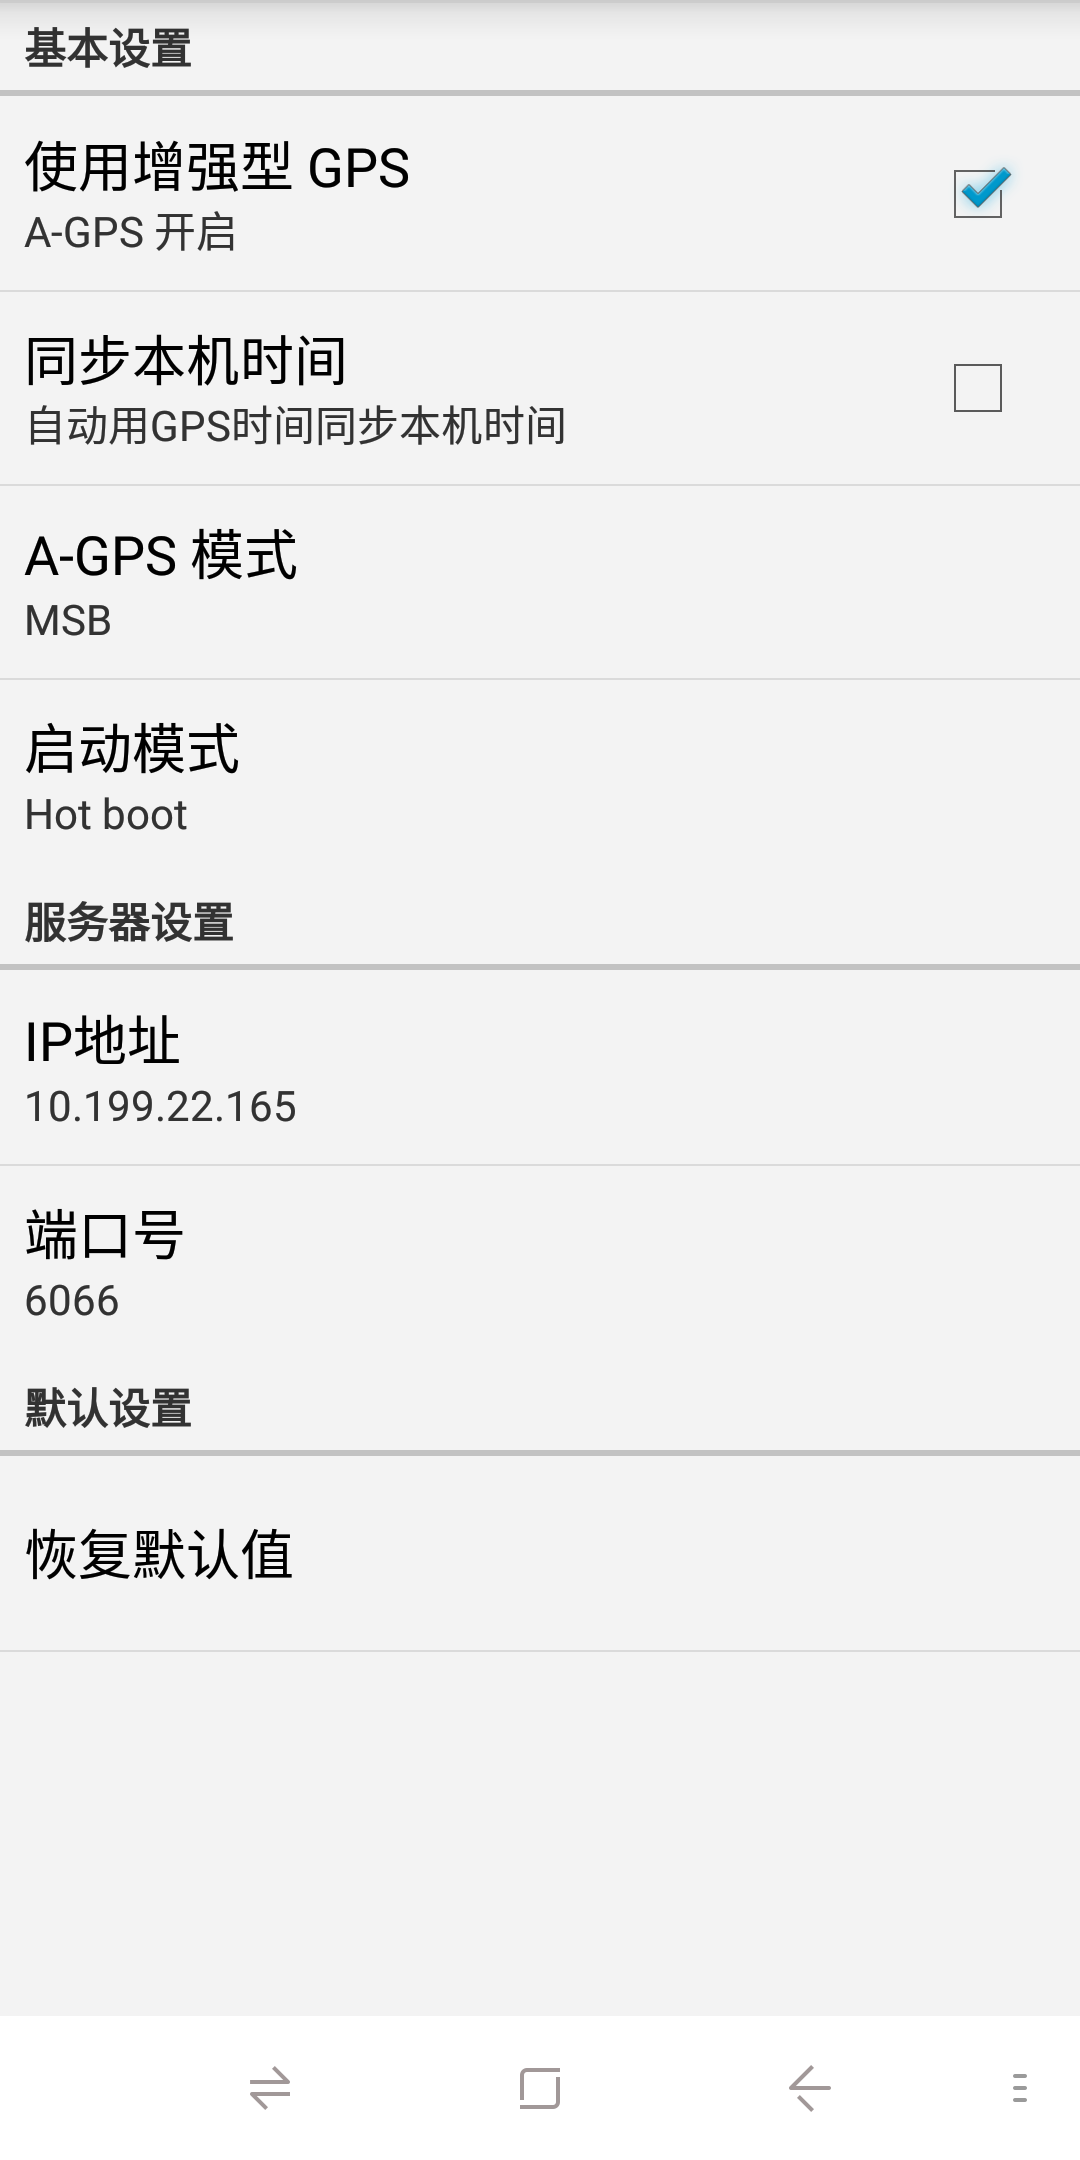 Screenshot_2020-08-04-06-59-56.png